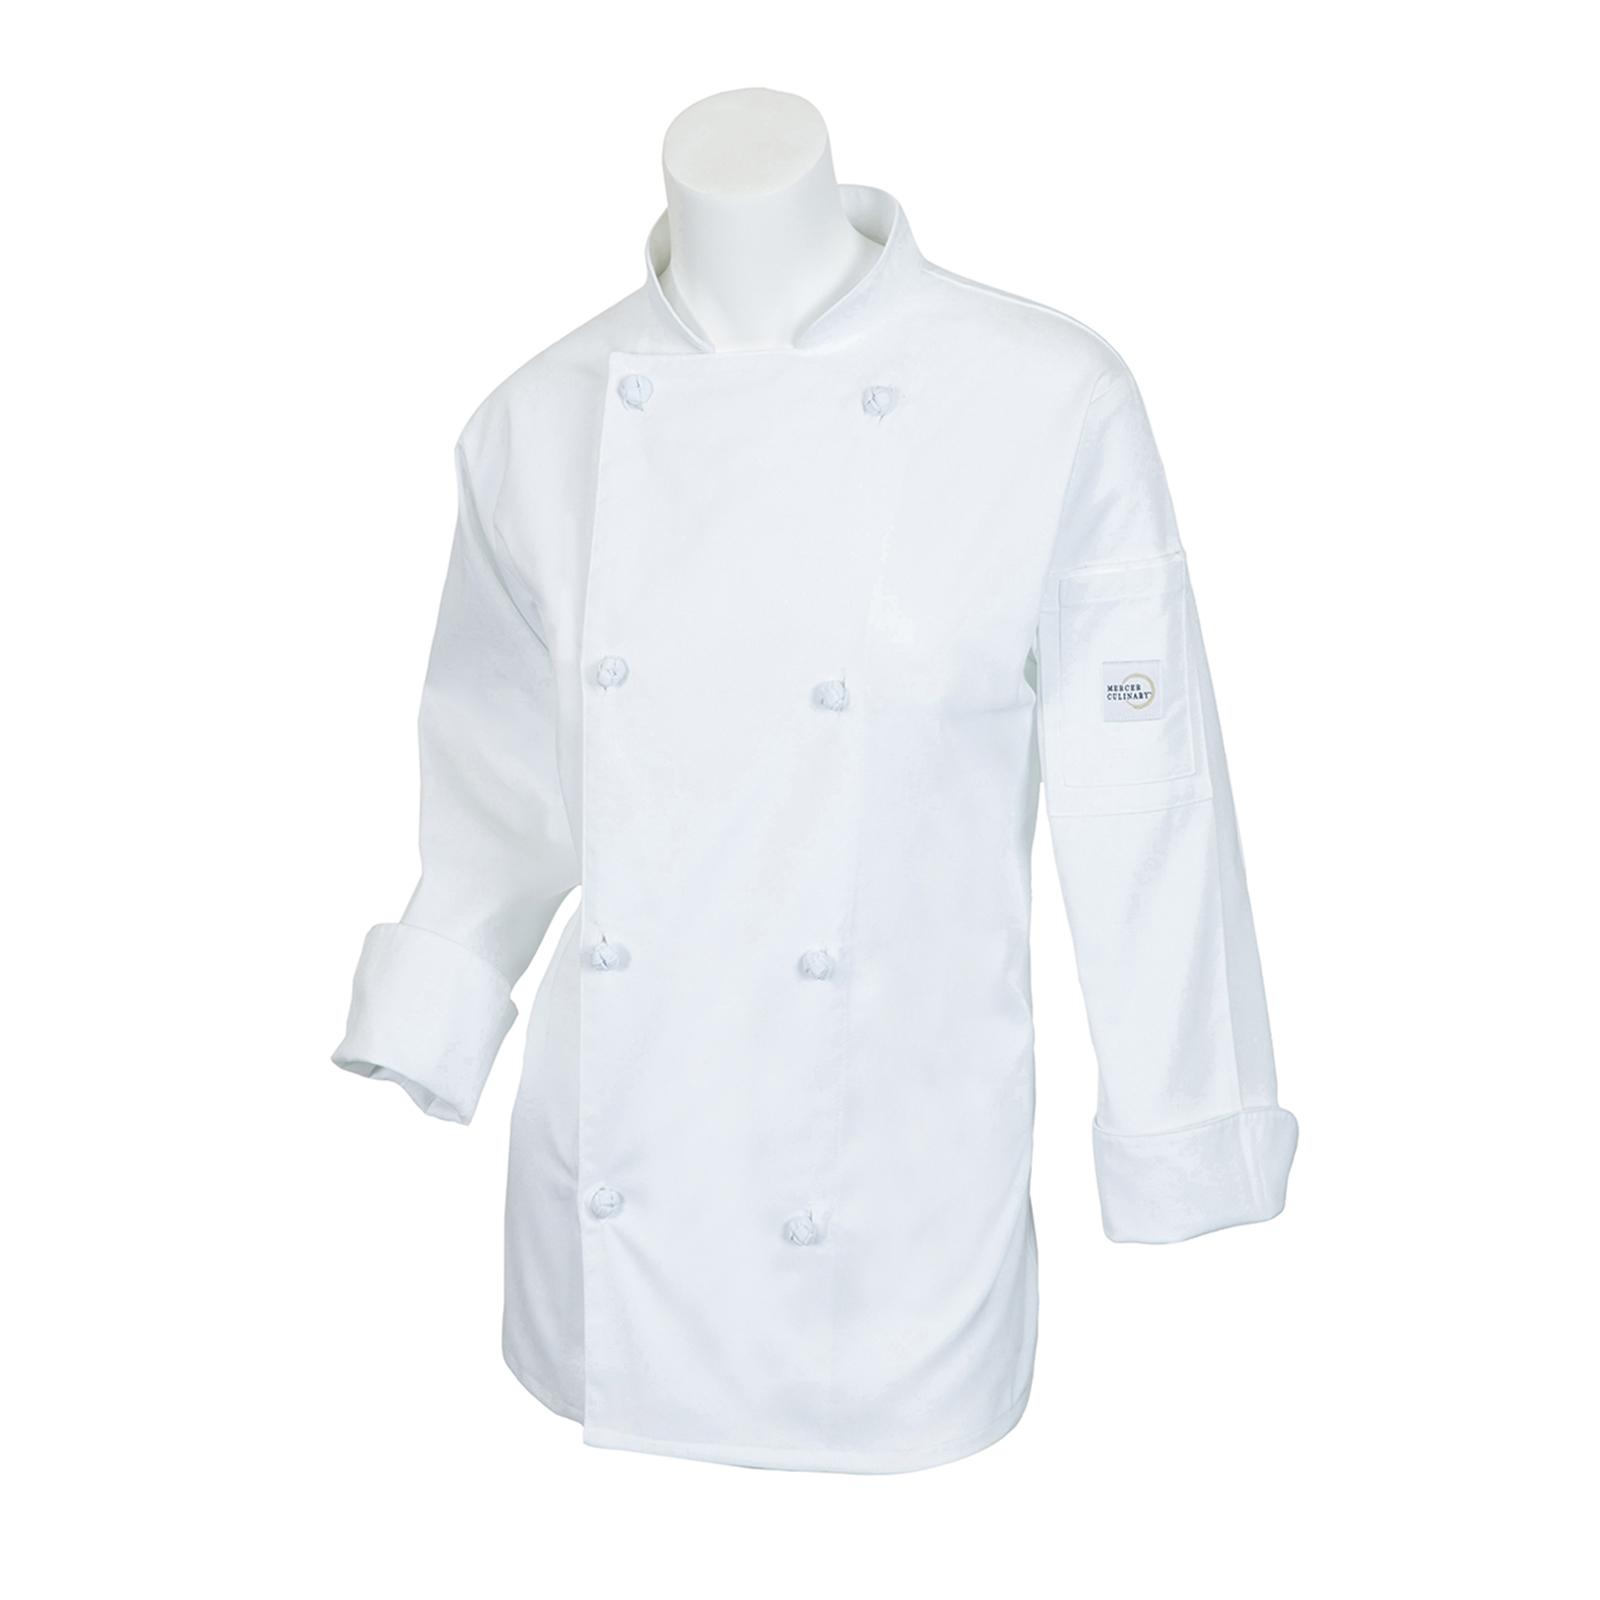 Mercer Culinary M61040WH1X chef's coat